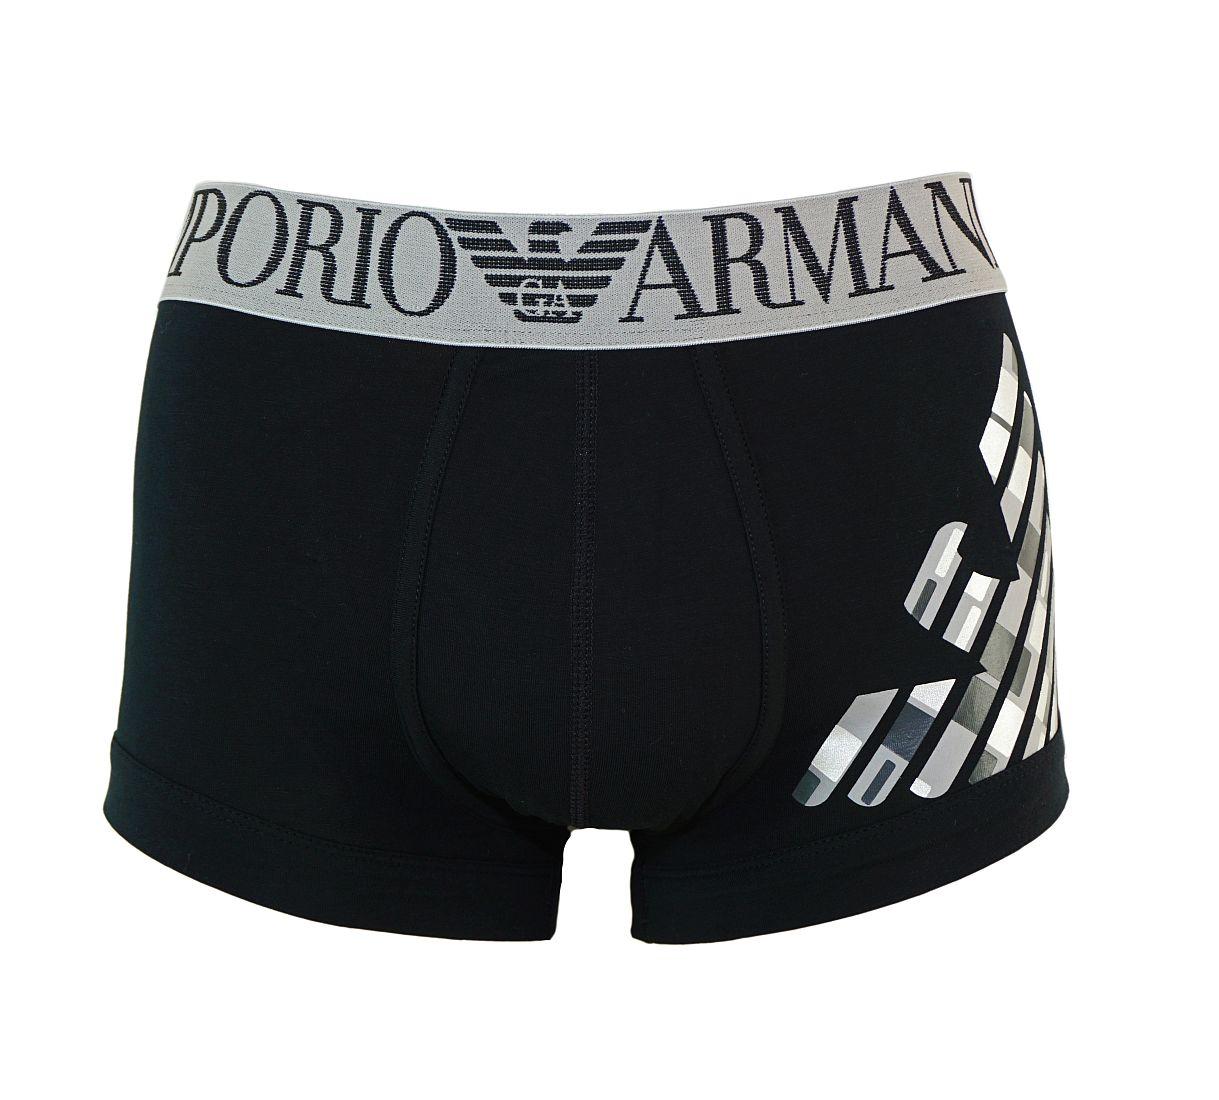 Emporio Armani Trunk Shorts Unterhose NERO 111866 7P745 00020 WF17-EAT1